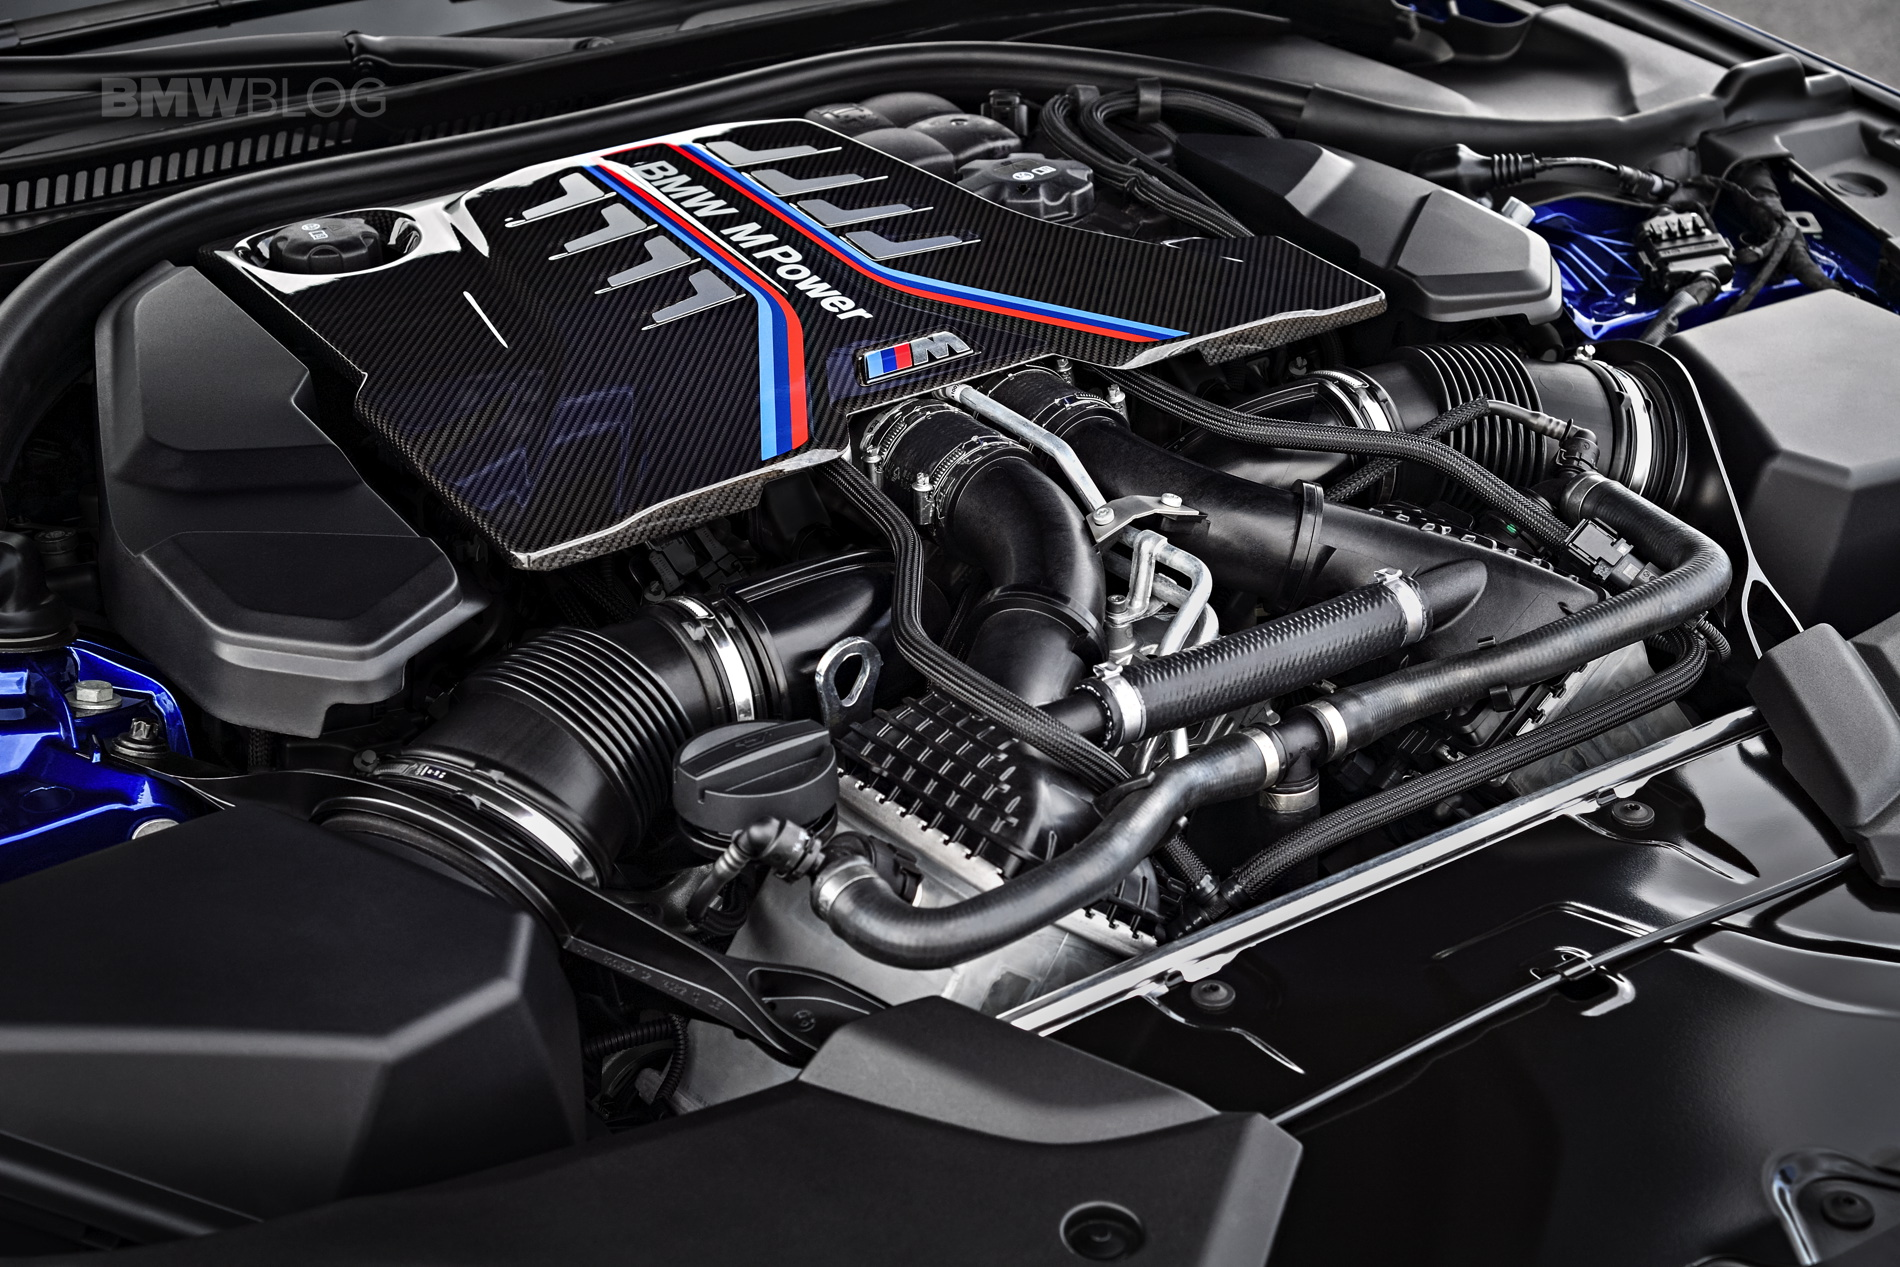 hight resolution of bmw m5 engine diagram wiring library 2013 bmw m5 performance bmw m5 engine diagram